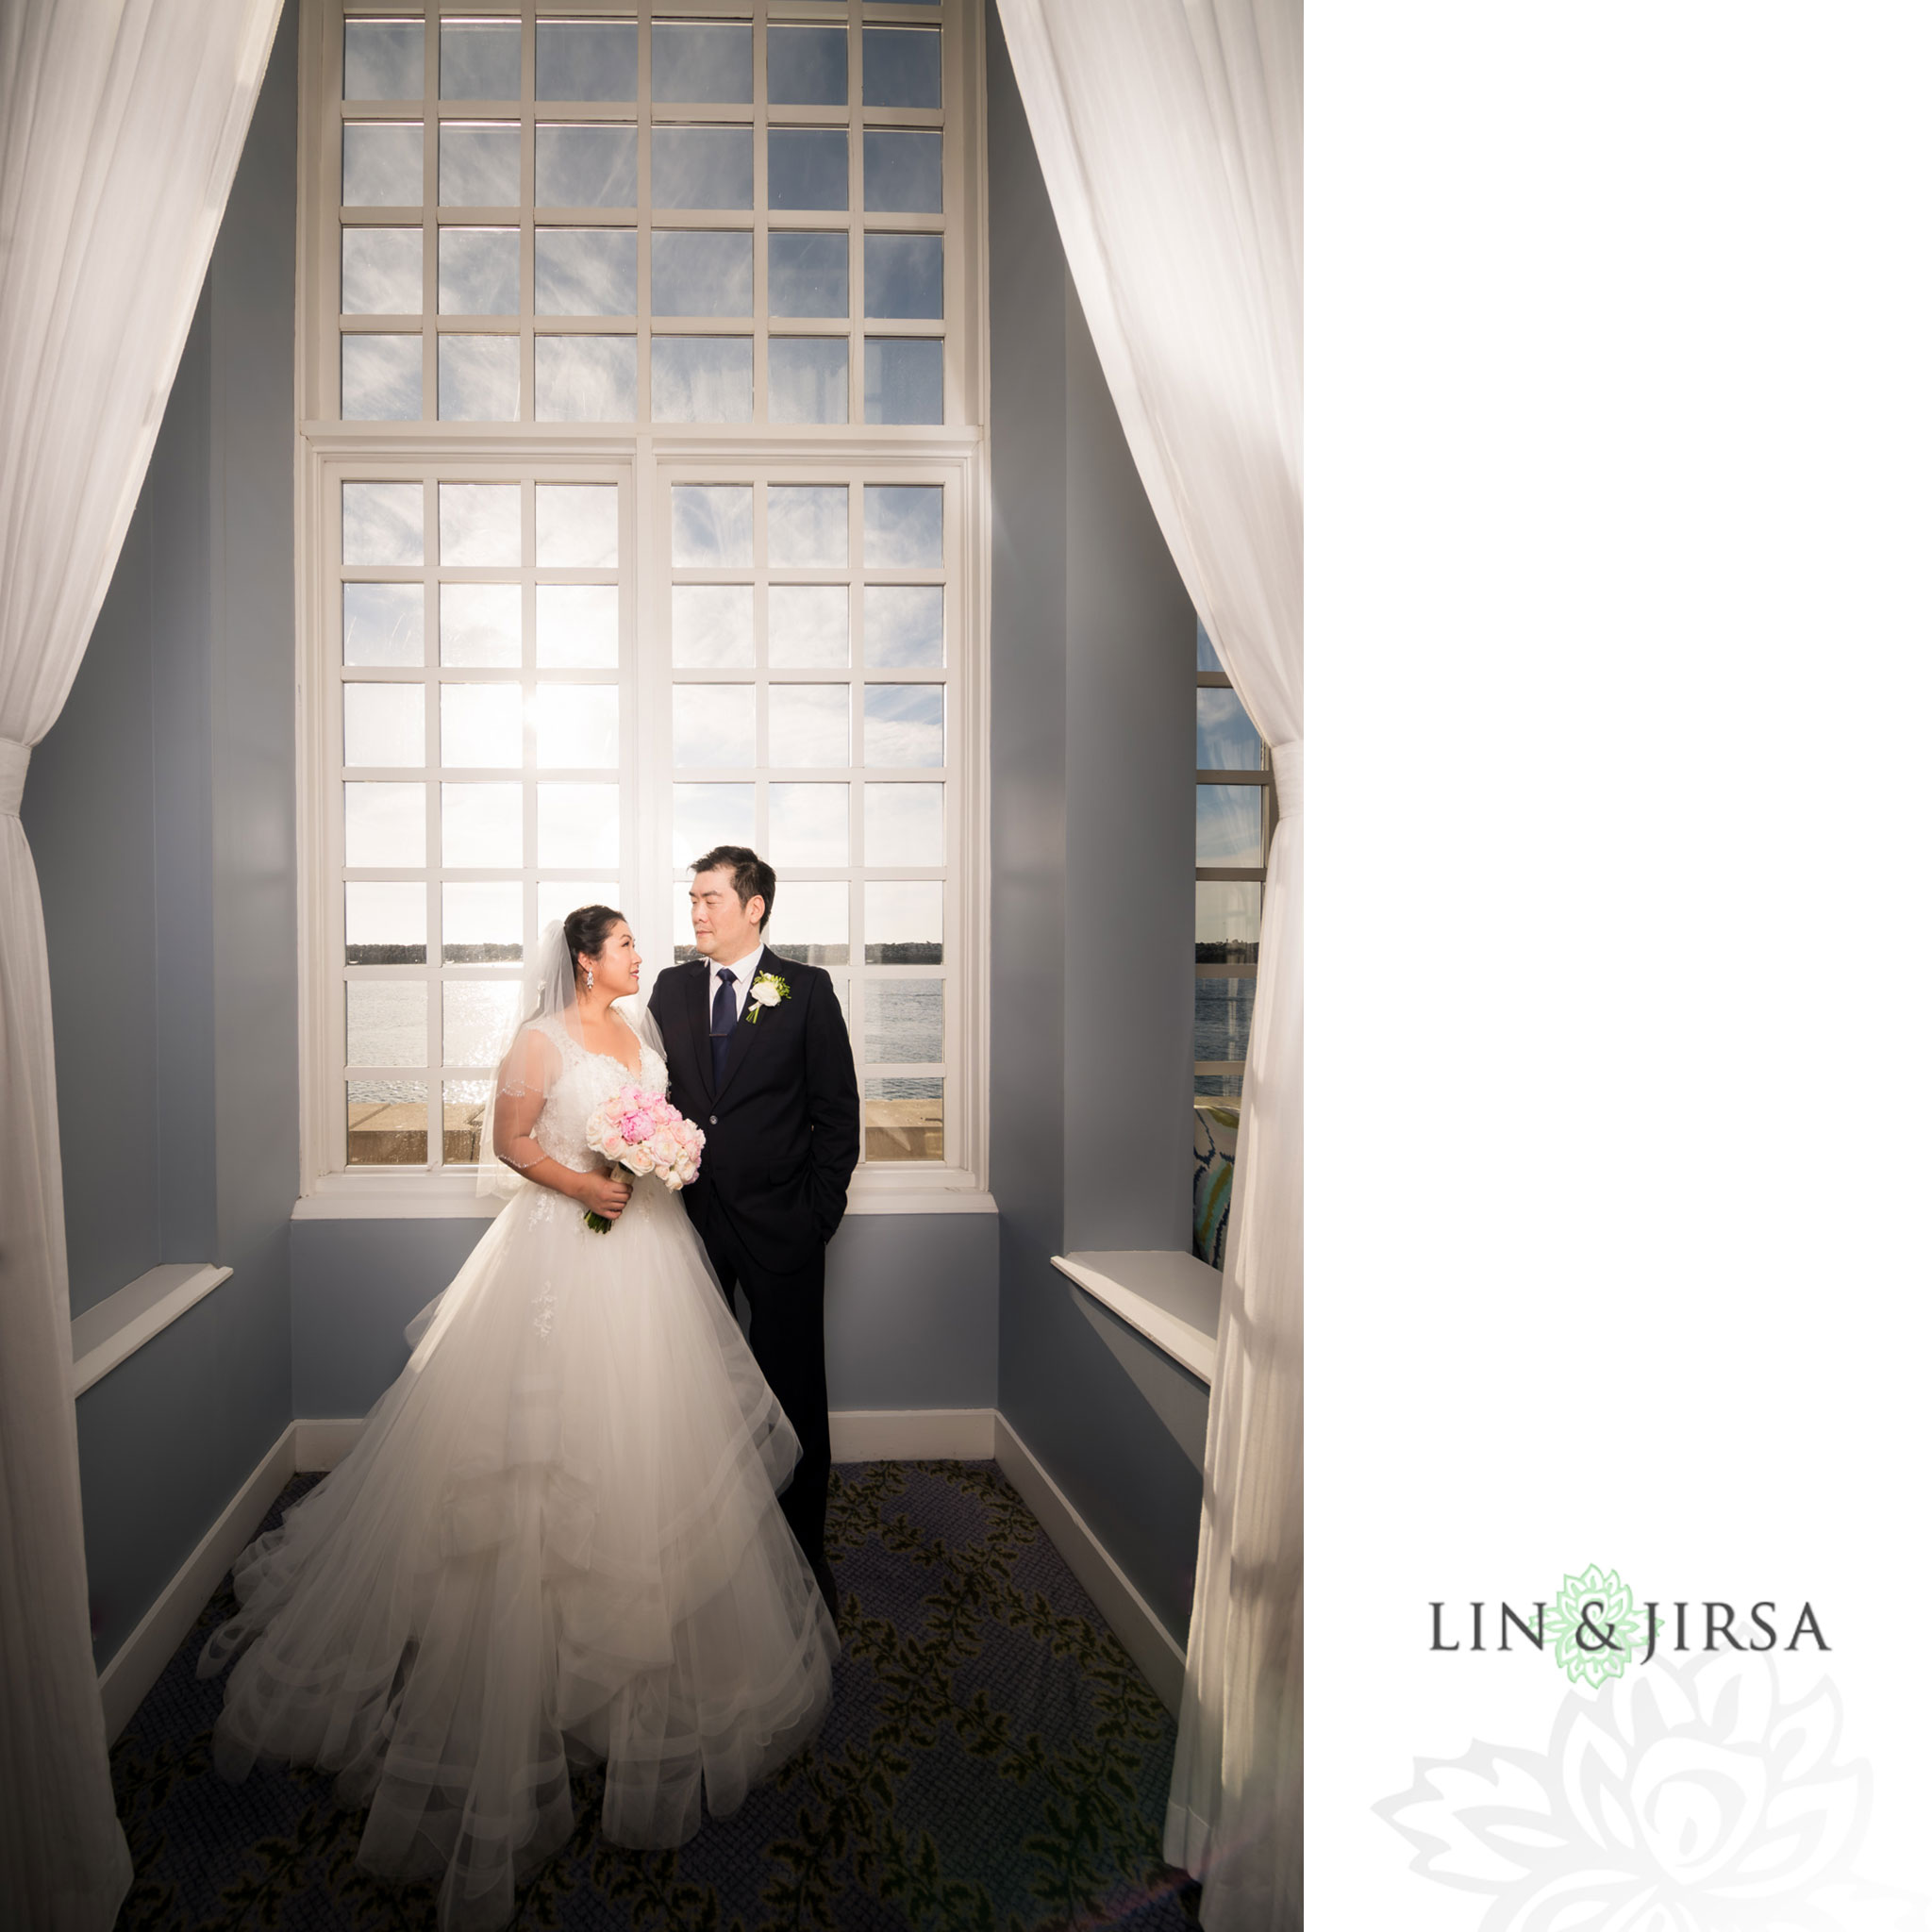 15 portofino hotel redondo beach bride groom wedding photography